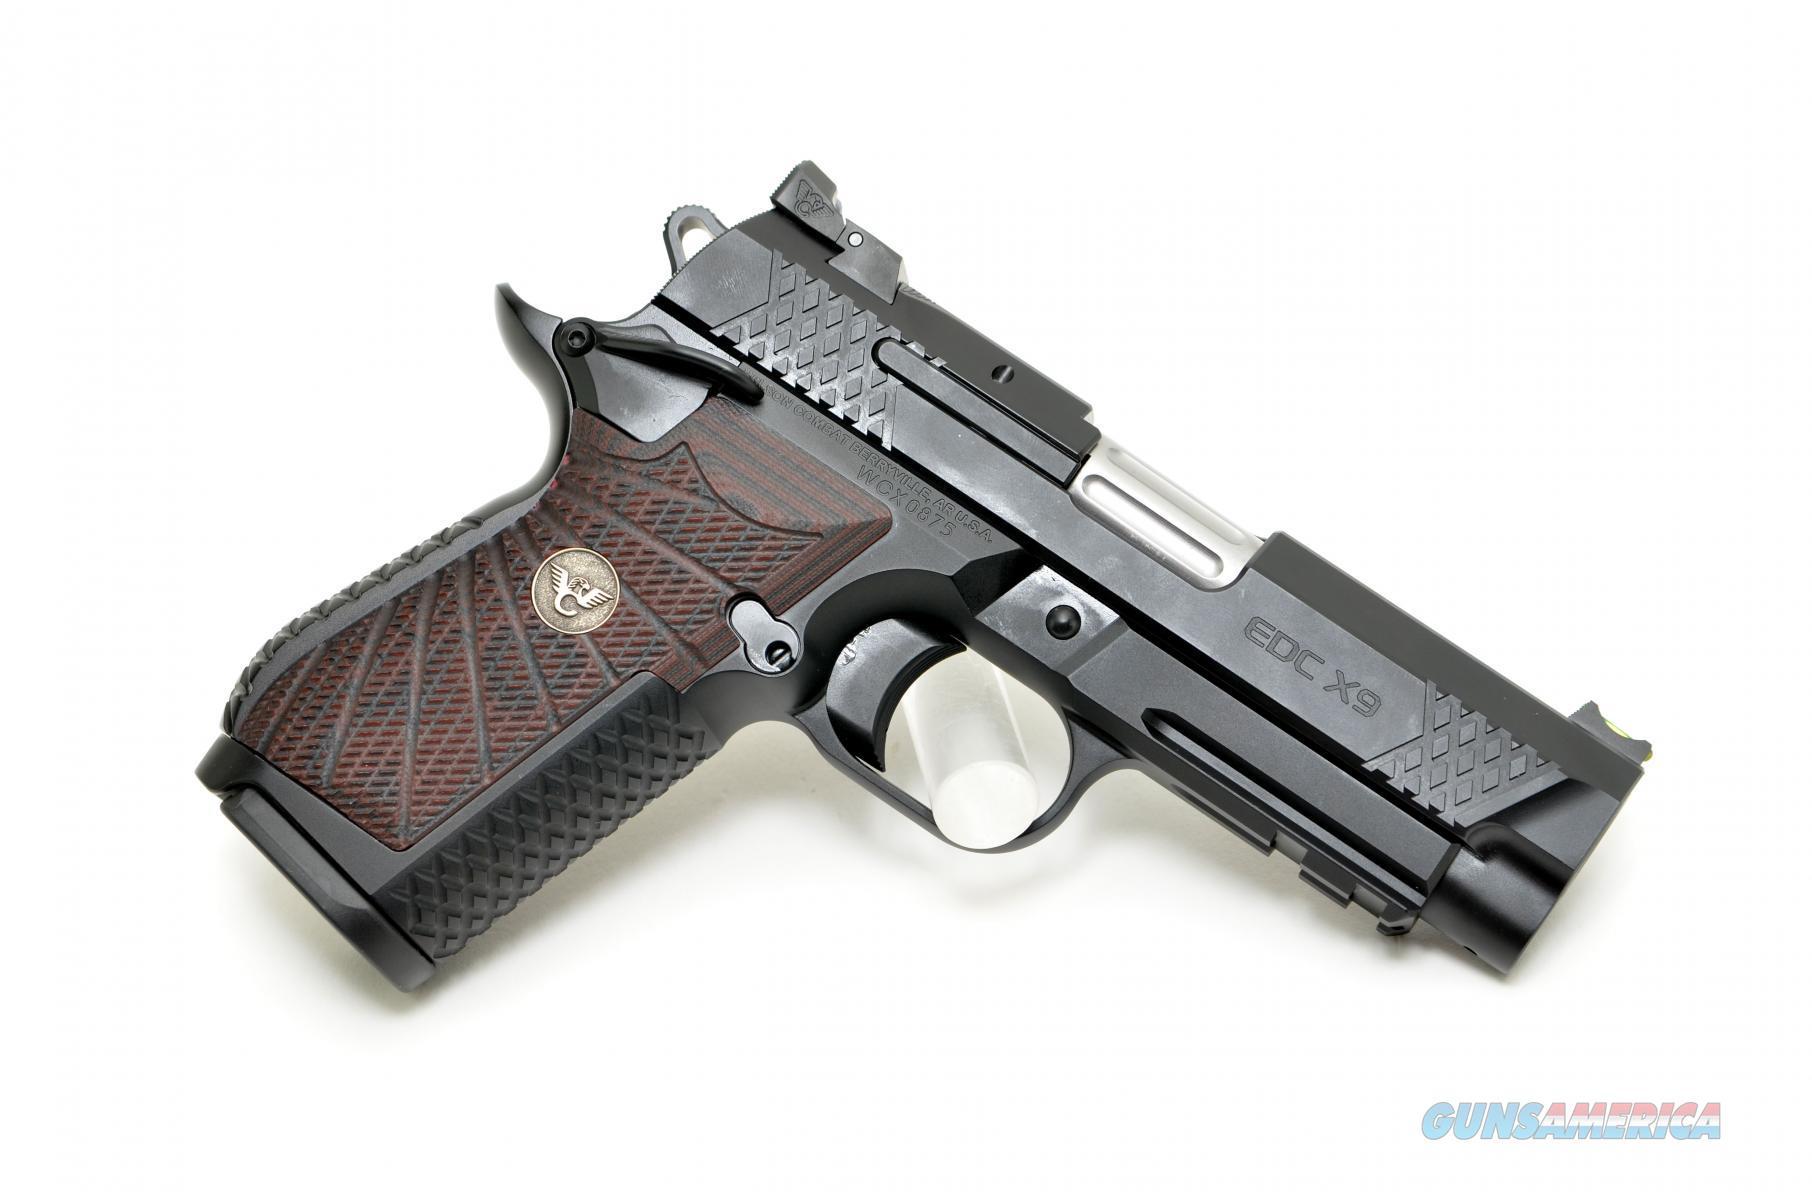 WILSON COMBAT EDC X9 - CPR W/ Lightrail - 9MM  Guns > Pistols > Wilson Combat Pistols